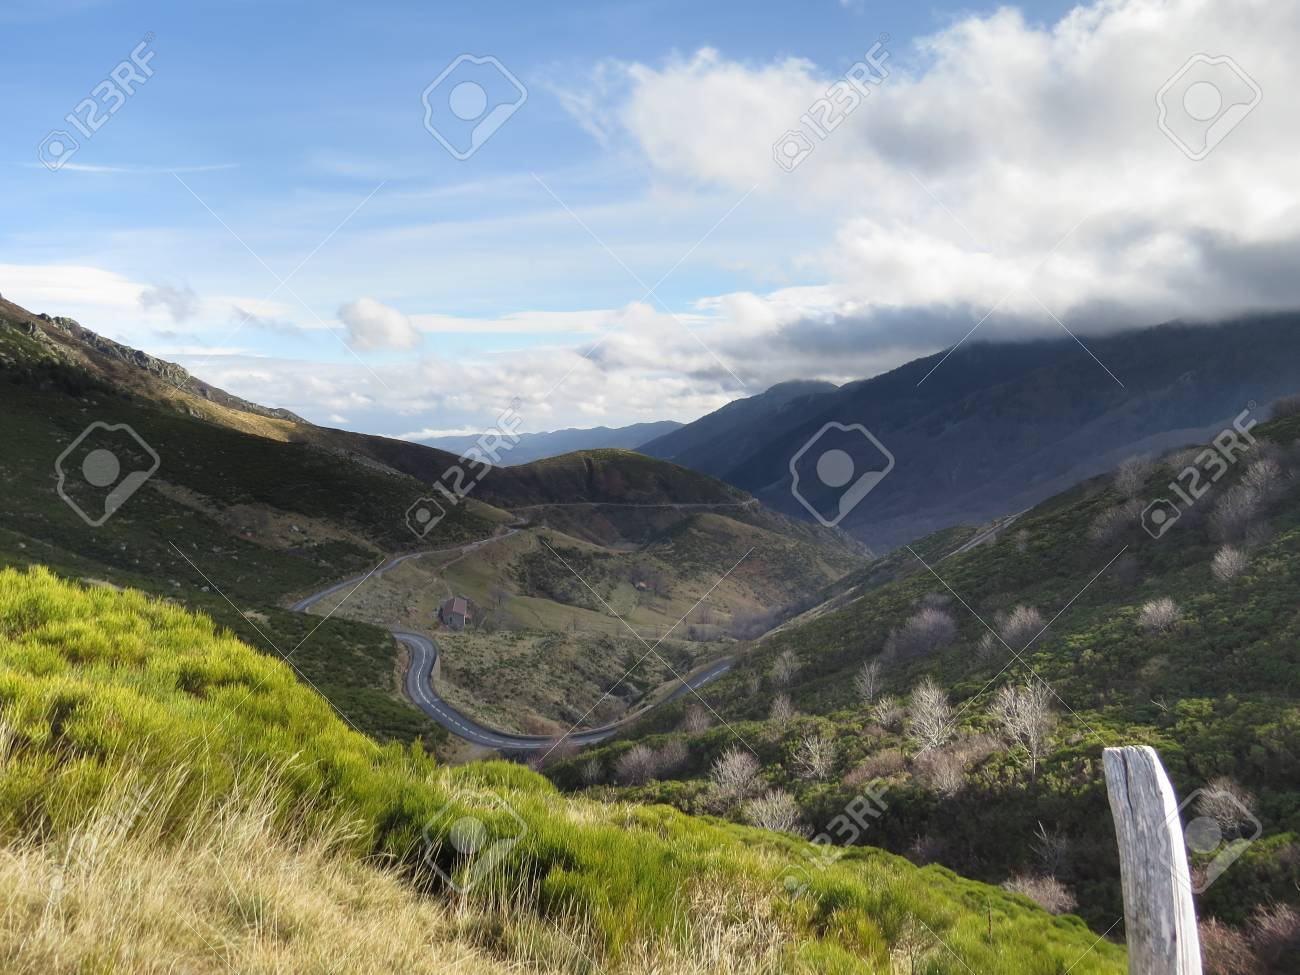 Panorama montagne ardechoise - 43390613